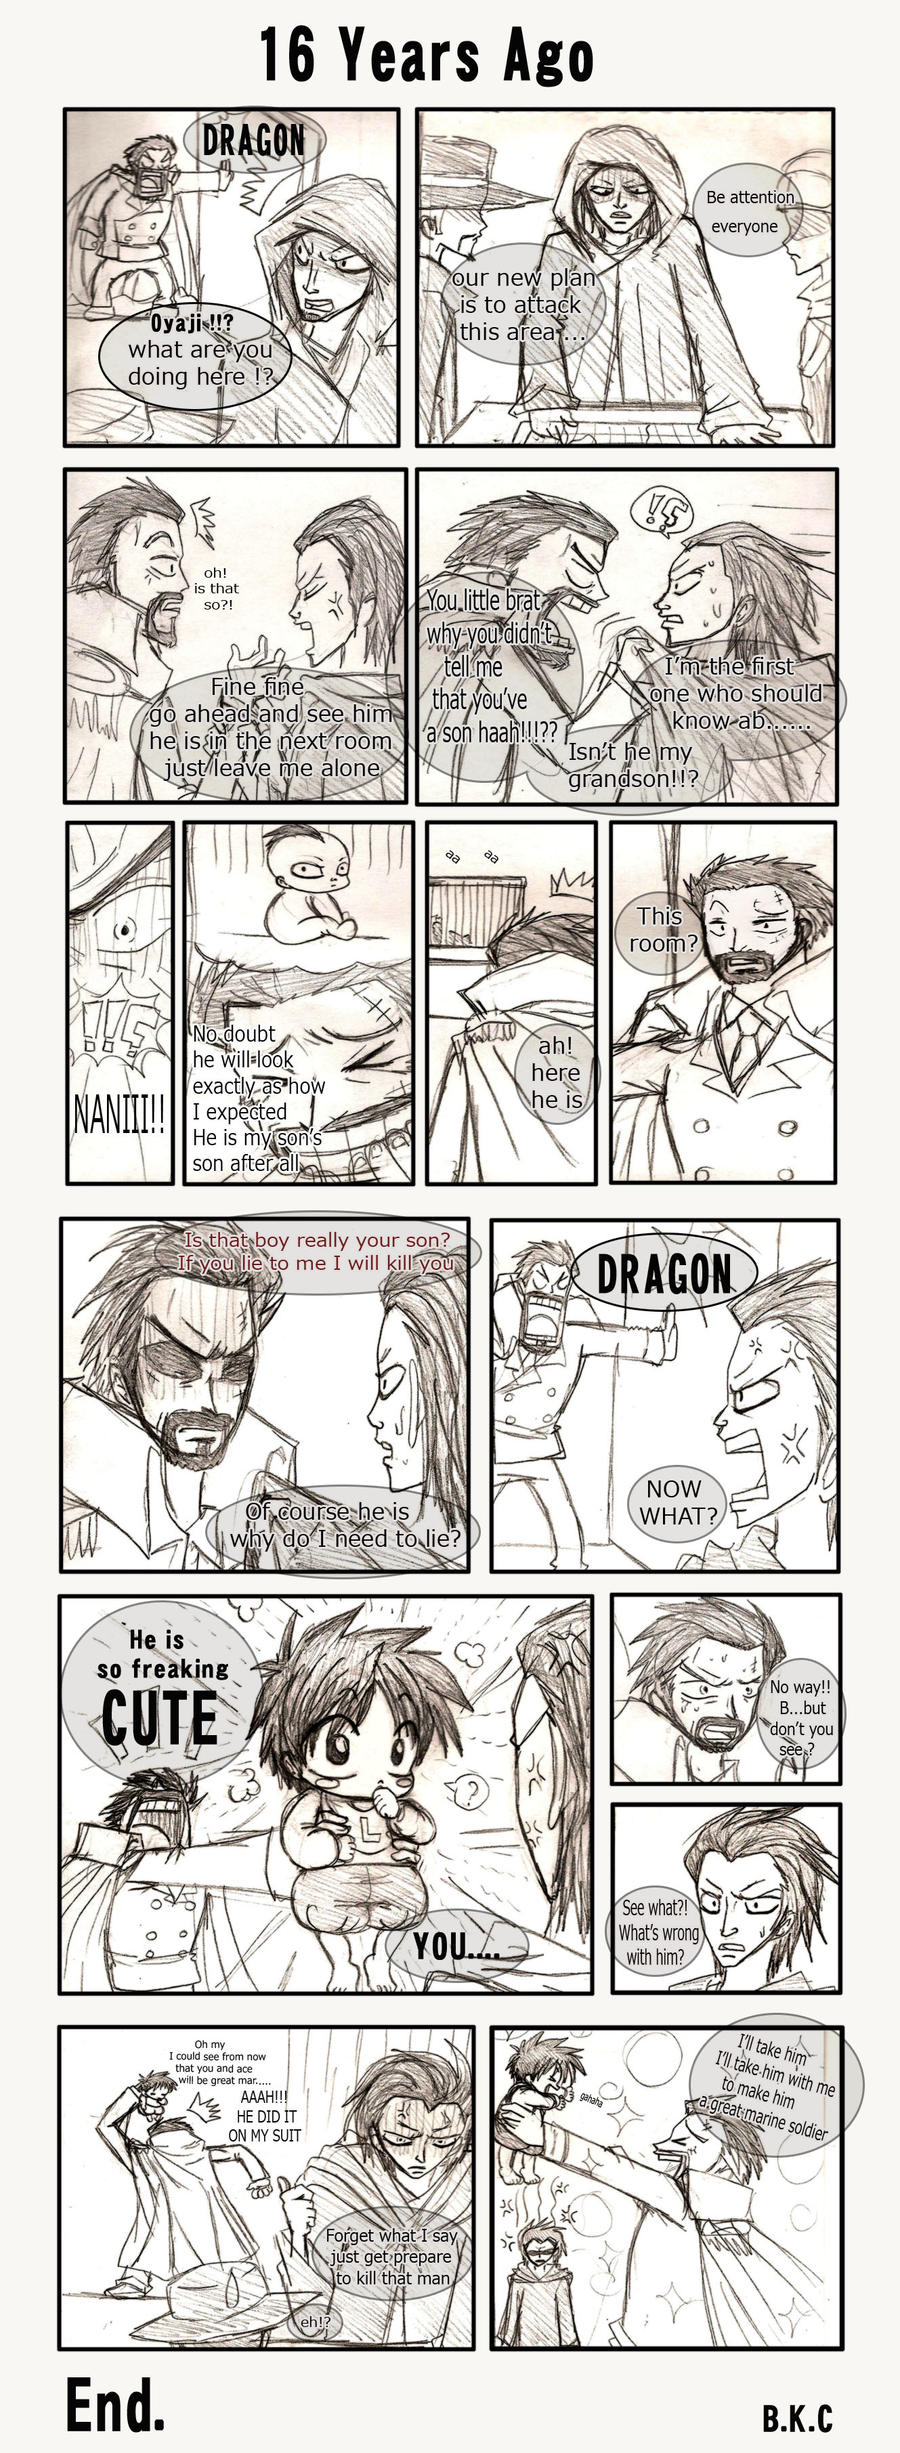 OP.dragon's son by bekacca